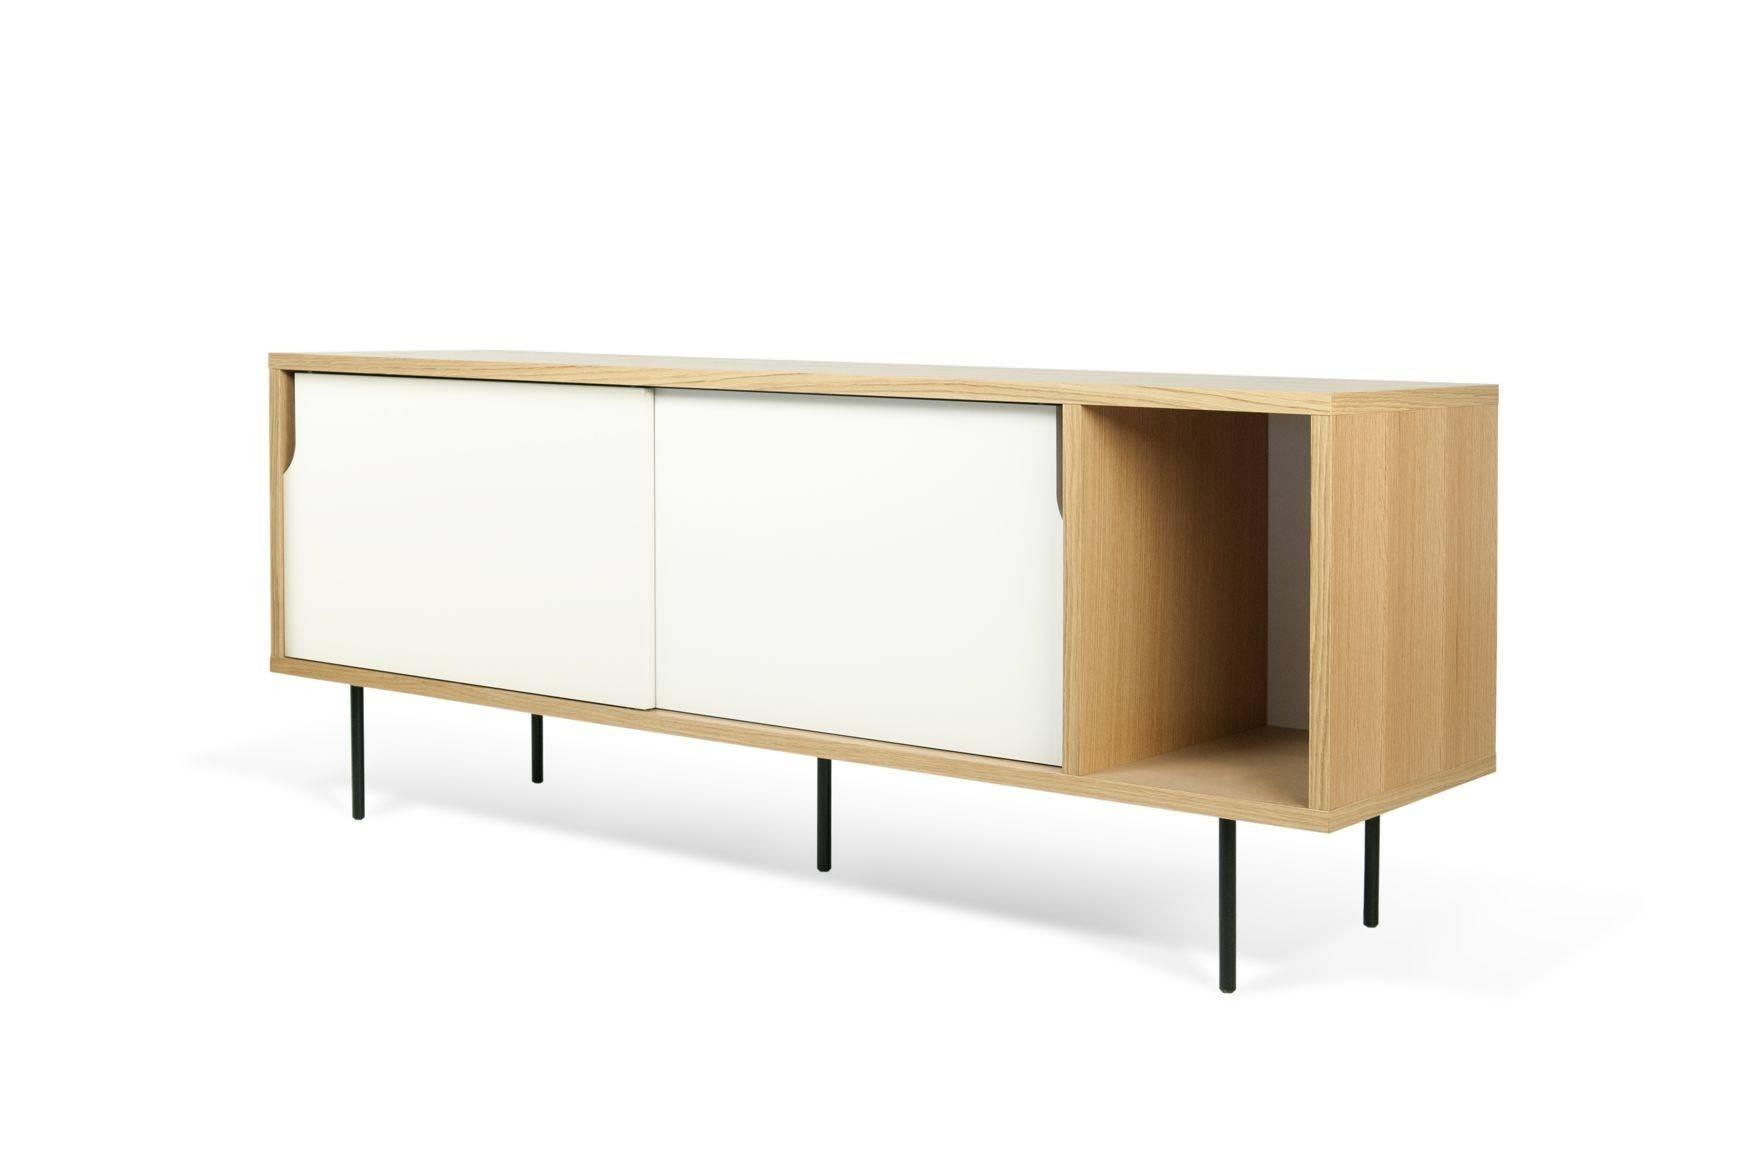 Dann 65 Modern Sideboard | Temahome In Modern Sideboard Furniture (#3 of 15)